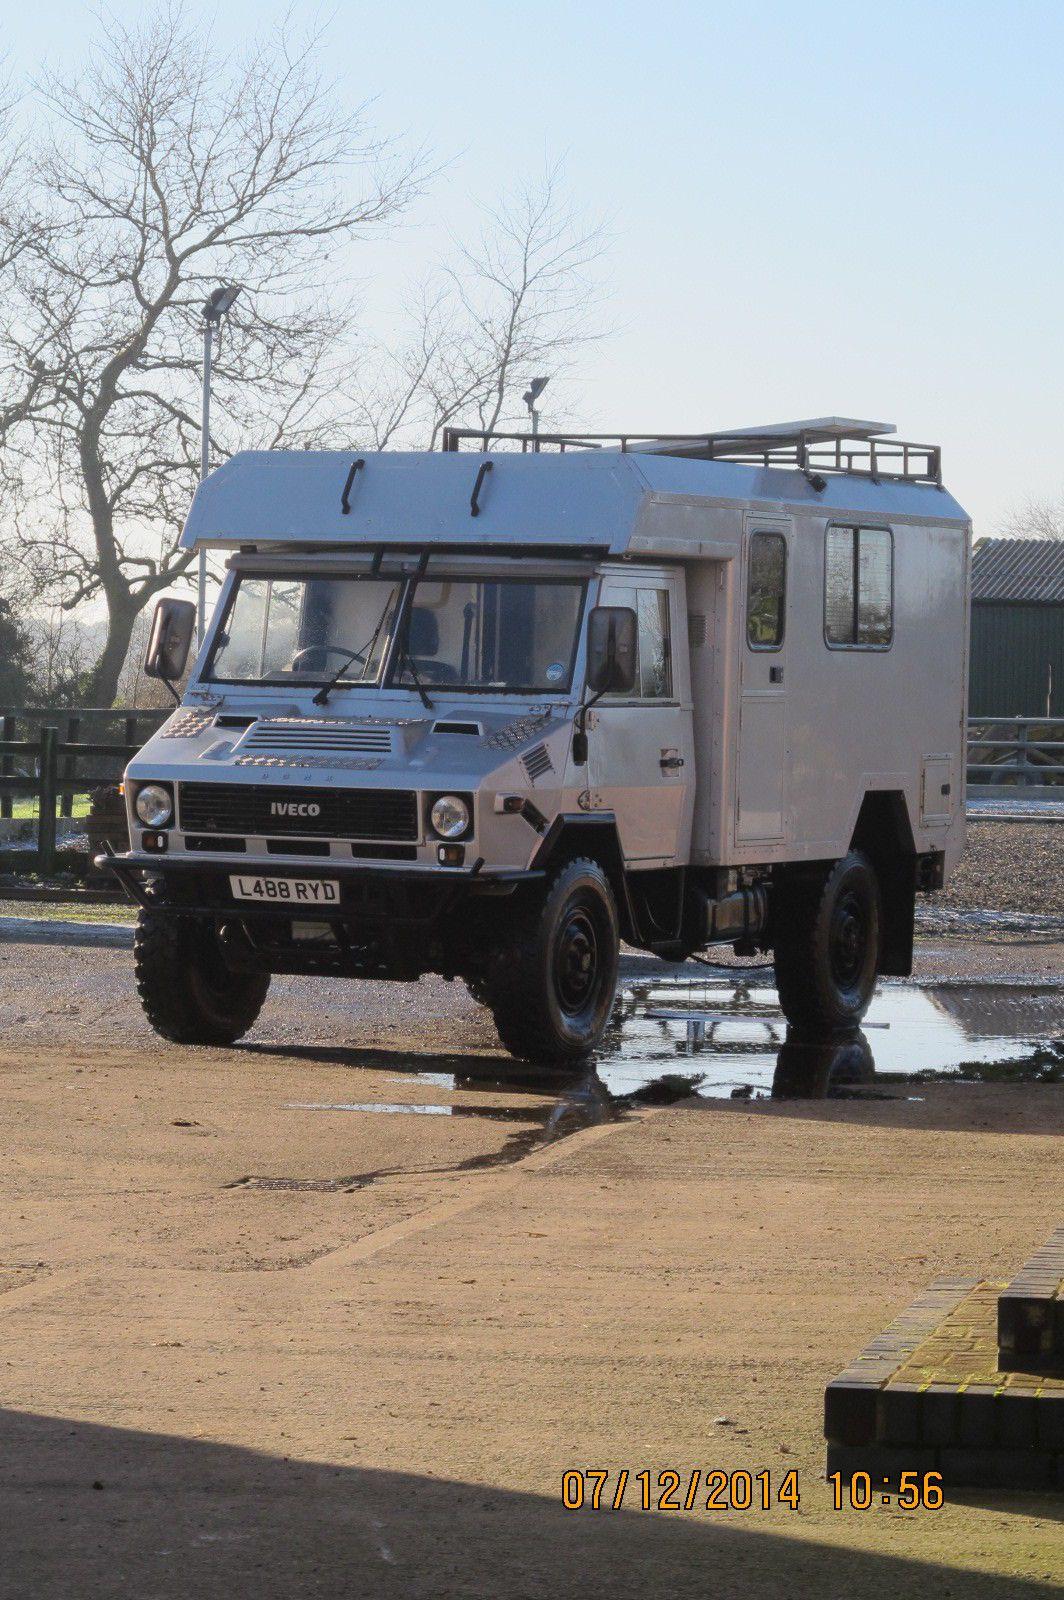 Iveco 40/10 WM 4x4 Expedition Camper | eBay When magirus